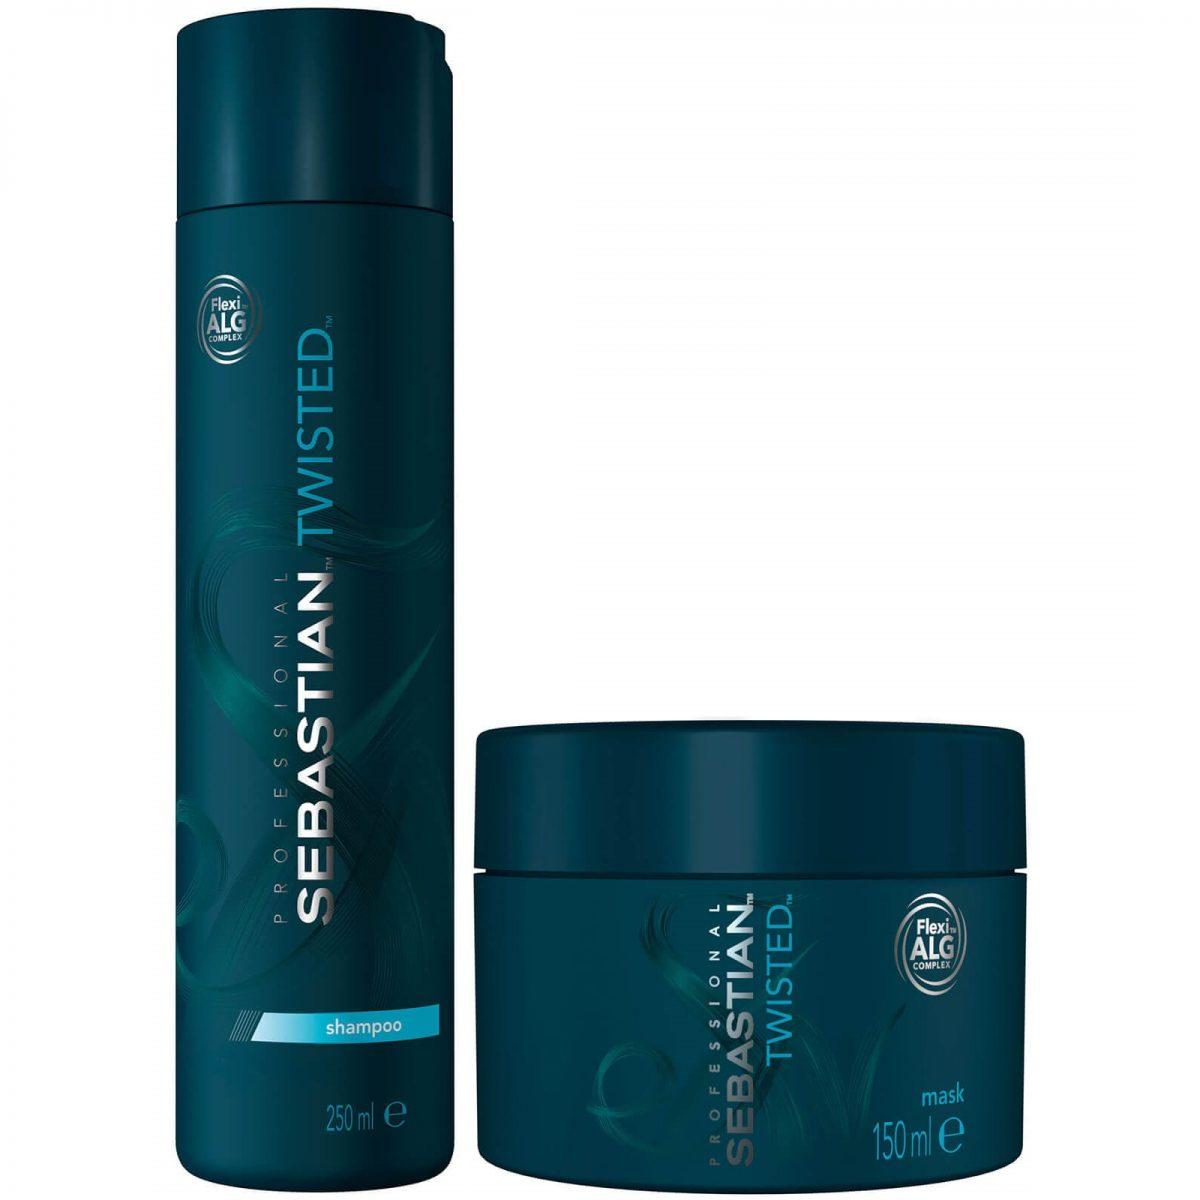 10_Emphase_Sebastian_Twisted_Shampoo_250ml_Mascarilla_150ml